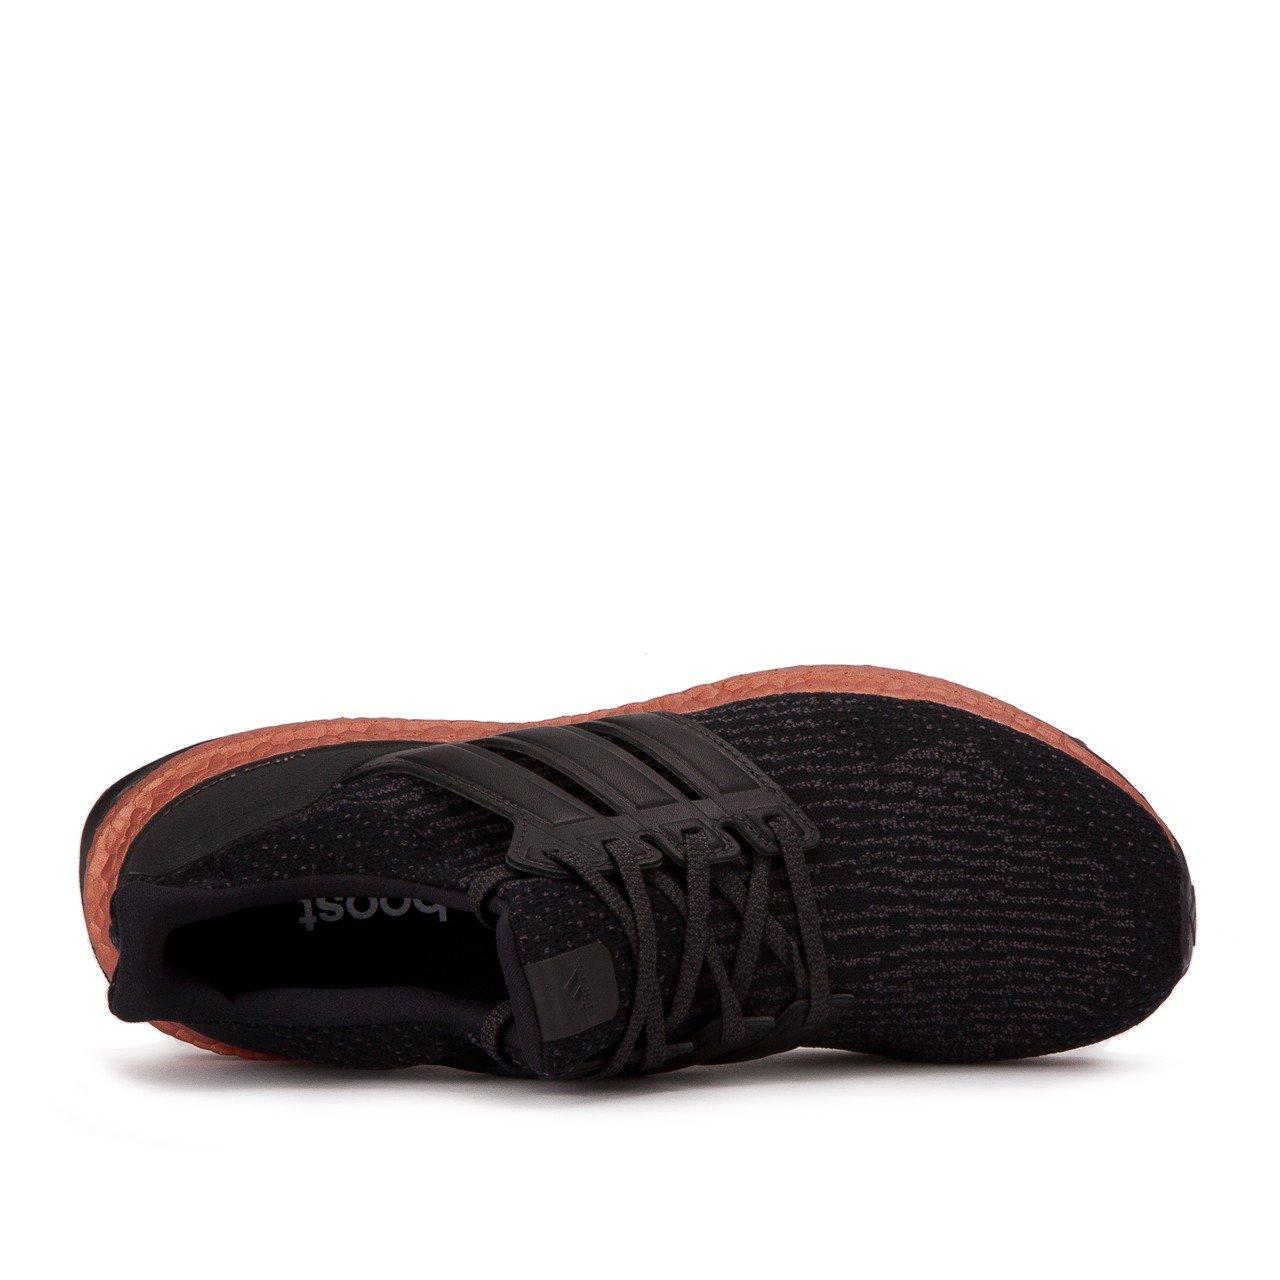 adidas Performance Men's Ultra Boost M Running Shoe B01NBMXZRV 6.5 D(M) US|Black/Black/Tech Rust